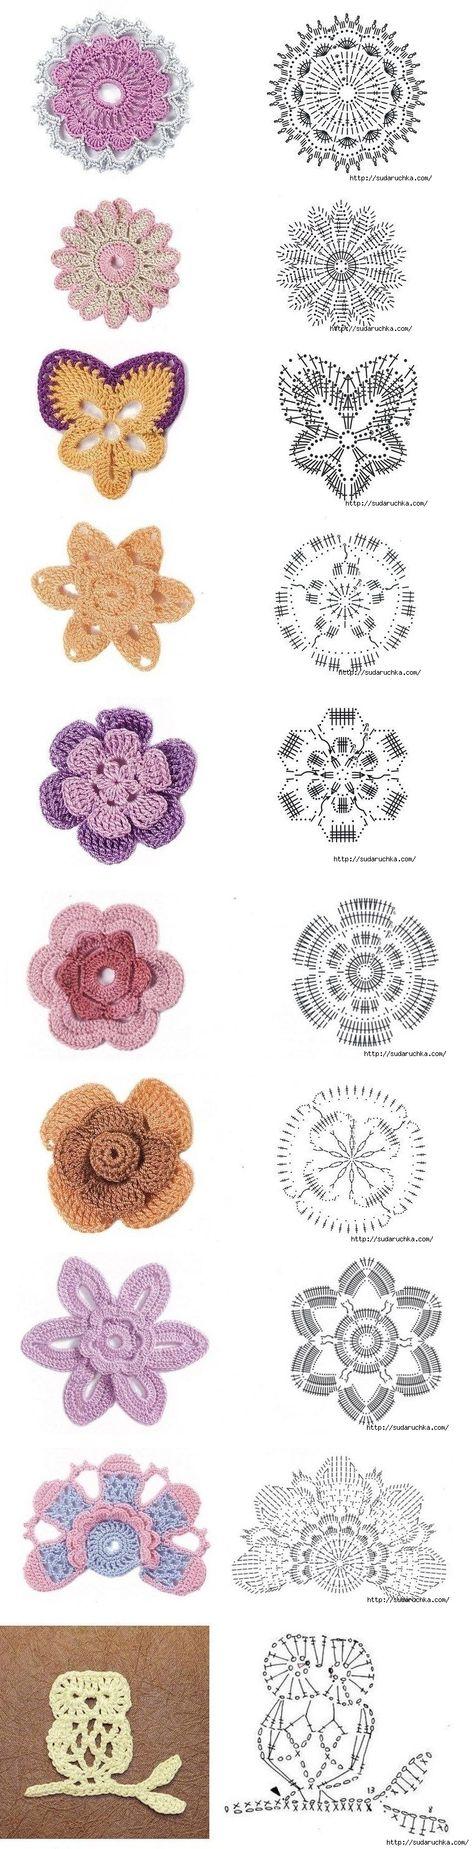 "Motivos a céu aberto. Esquemas de crochê. . ☀CQ <a class=""pintag"" href=""/explore/crochet/"" title=""#crochet explore Pinterest"">#crochet</a> <a class=""pintag"" href=""/explore/crafts/"" title=""#crafts explore Pinterest"">#crafts</a> <a class=""pintag"" href=""/explore/DIY/"" title=""#DIY explore Pinterest"">#DIY</a>"